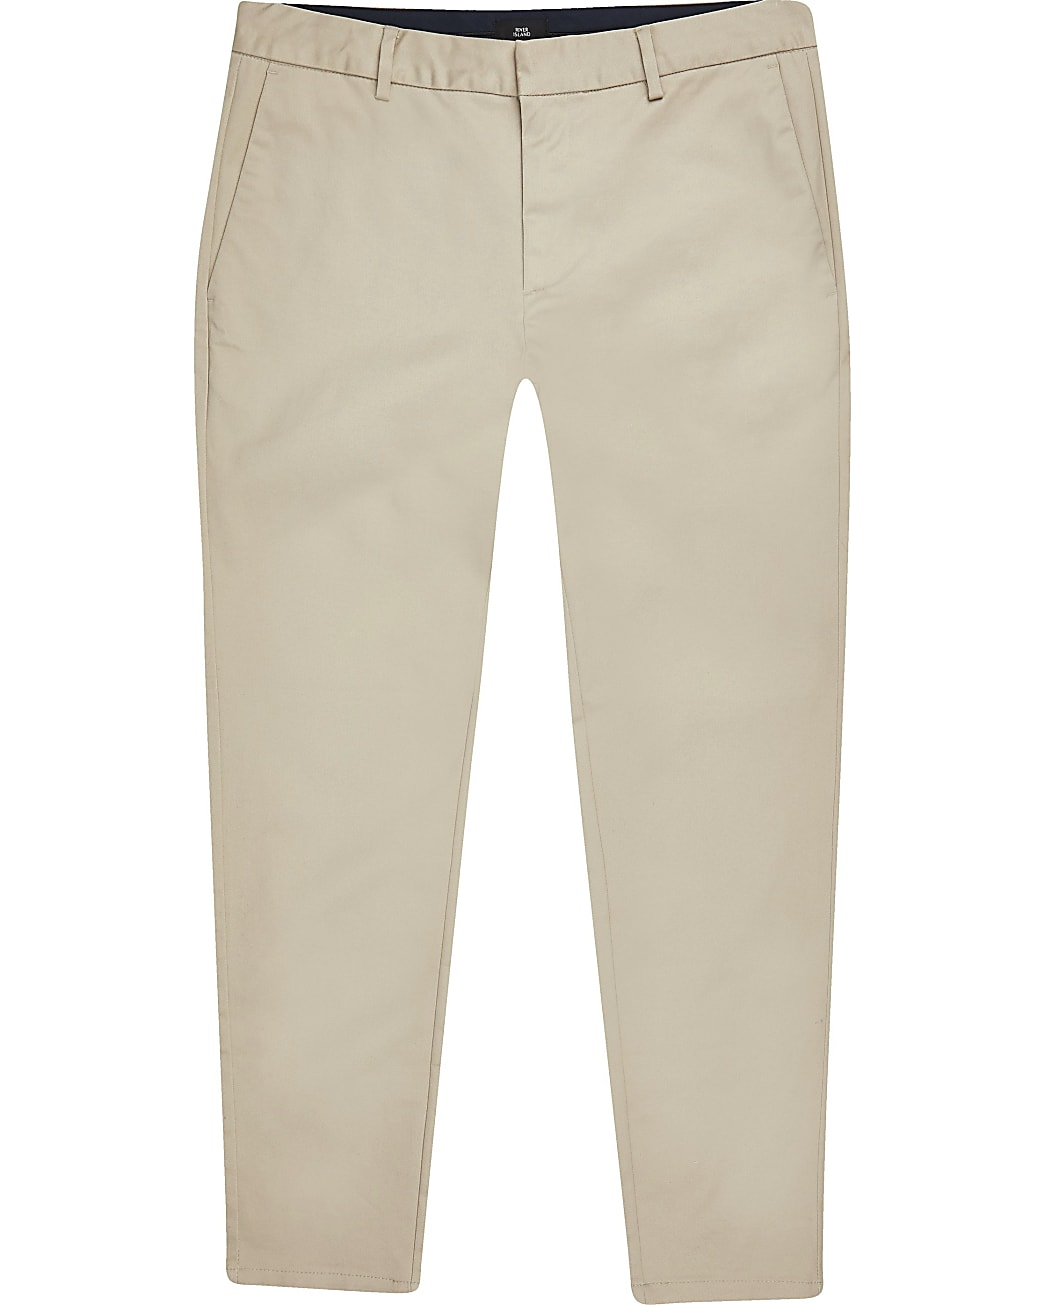 Big & tall stone skinny fit chino trousers